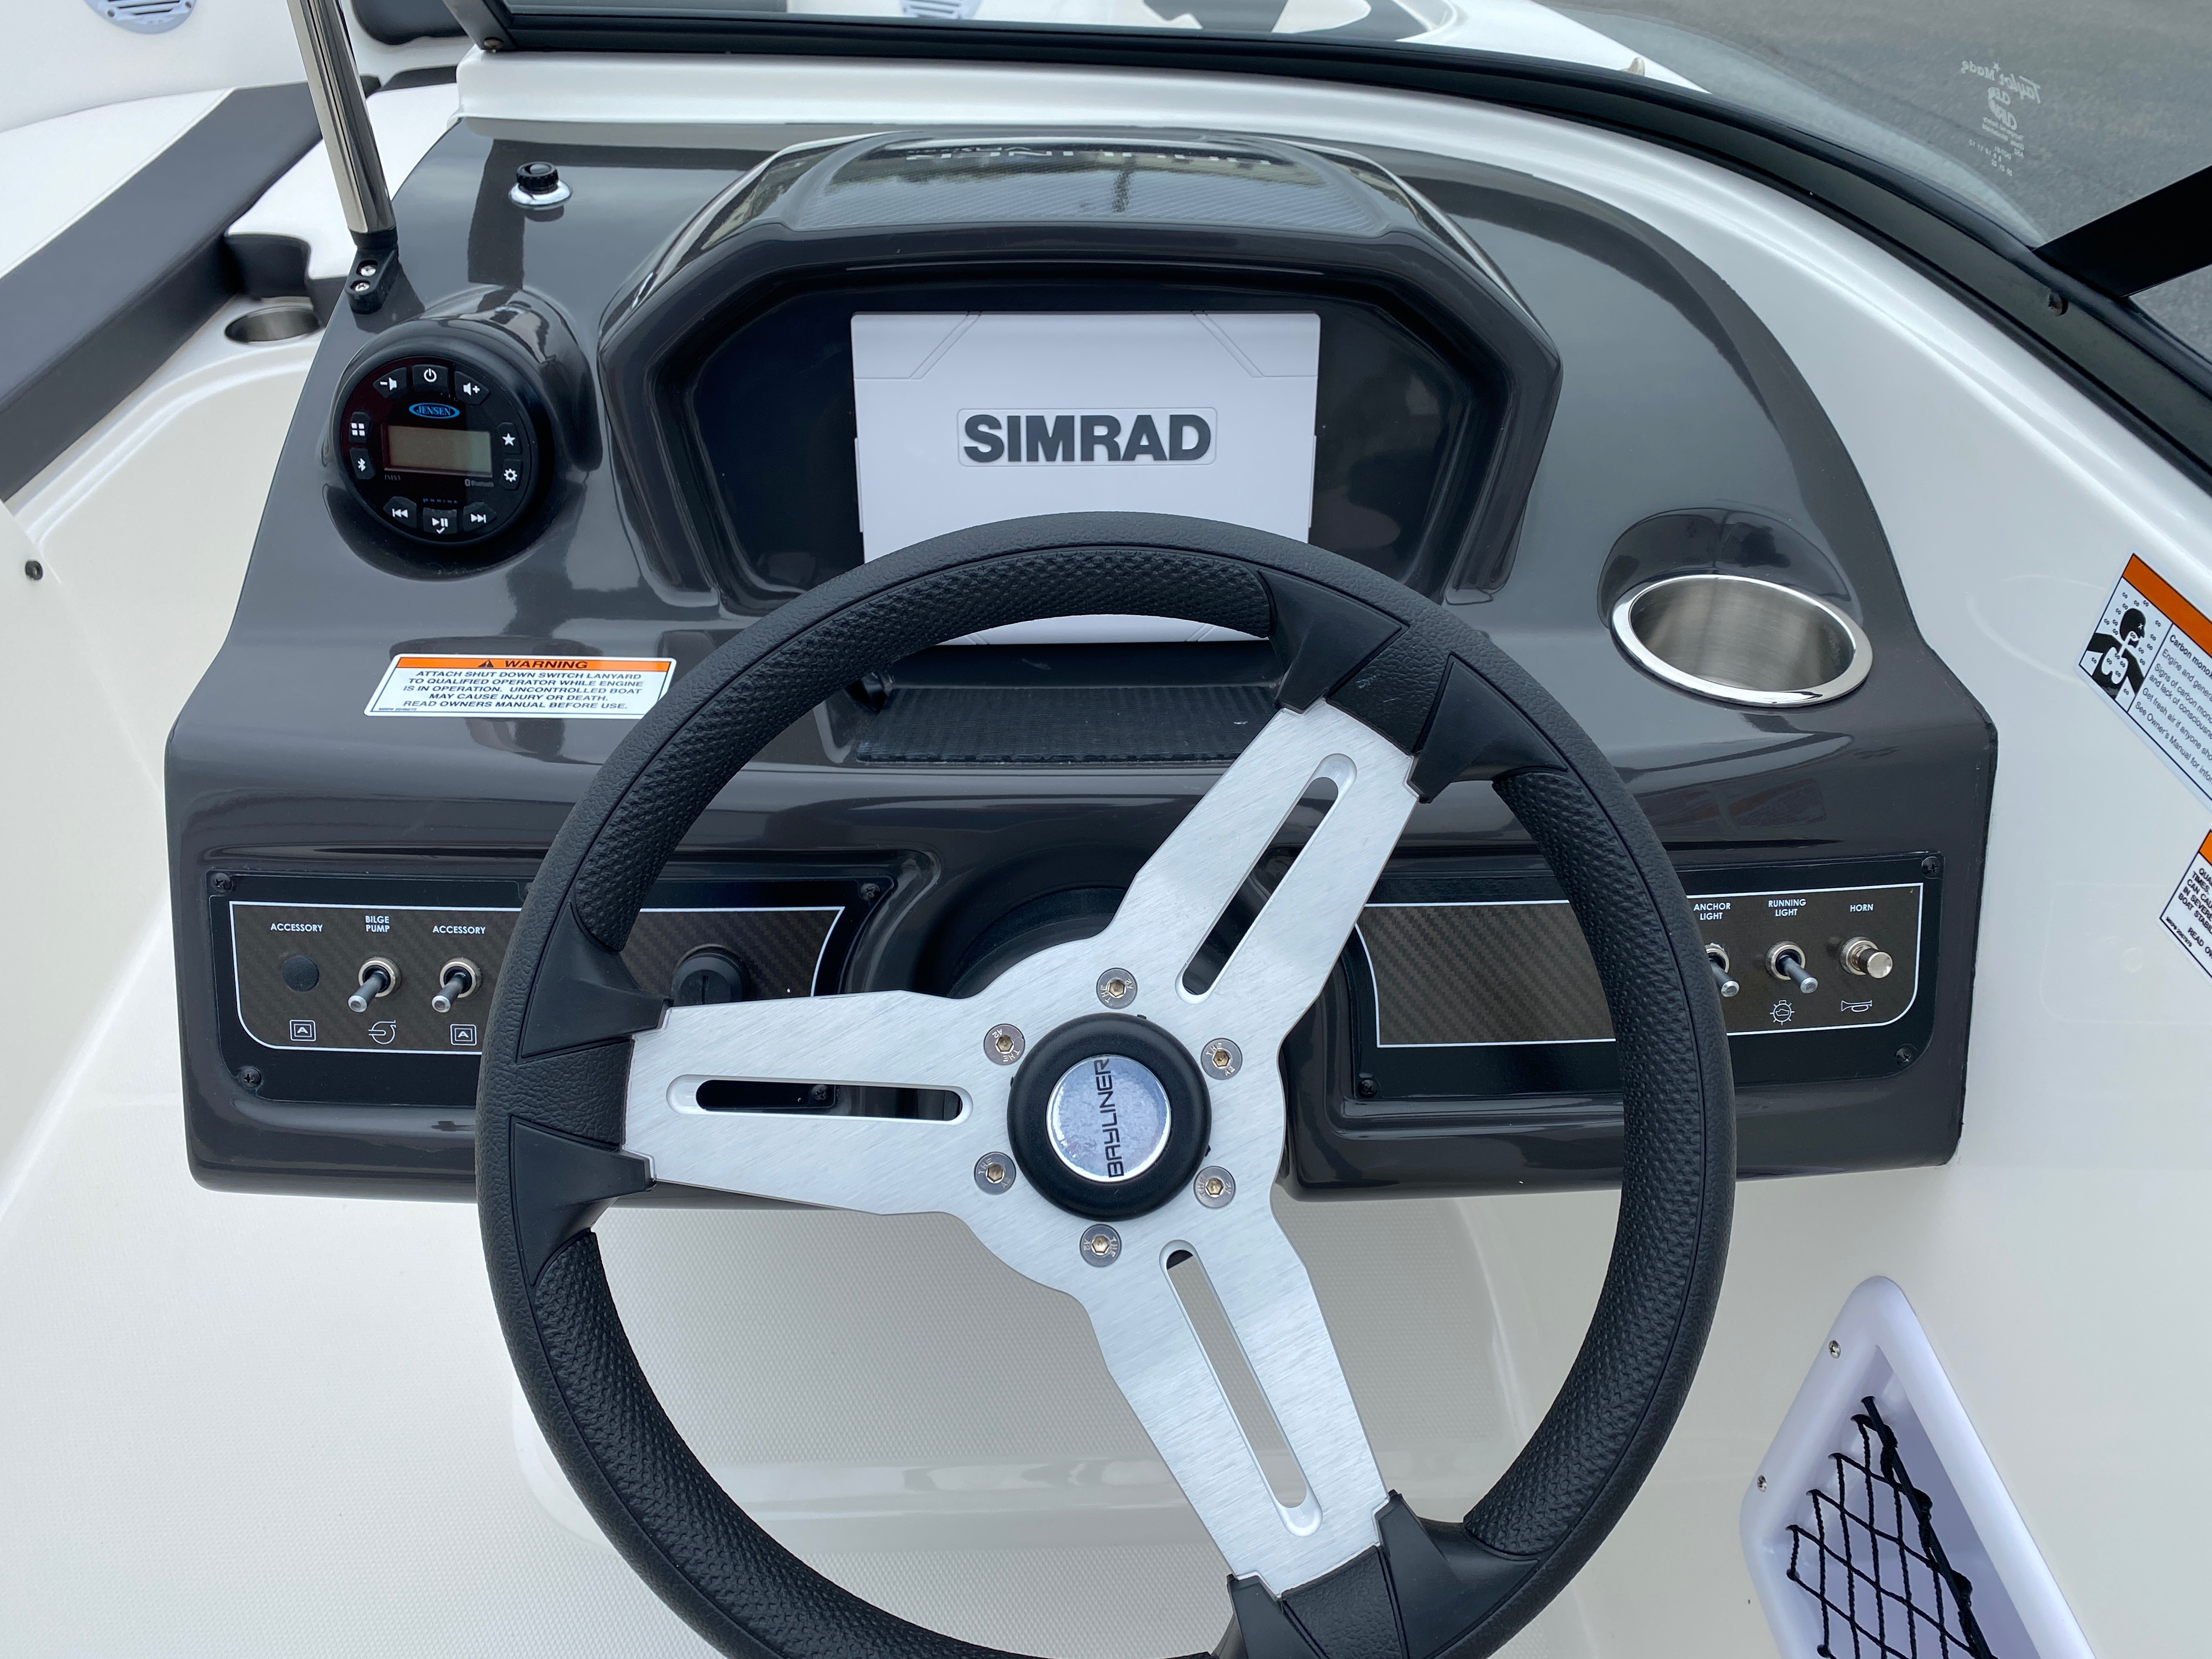 2020 Bayliner boat for sale, model of the boat is VR6 Bowrider & Image # 13 of 14